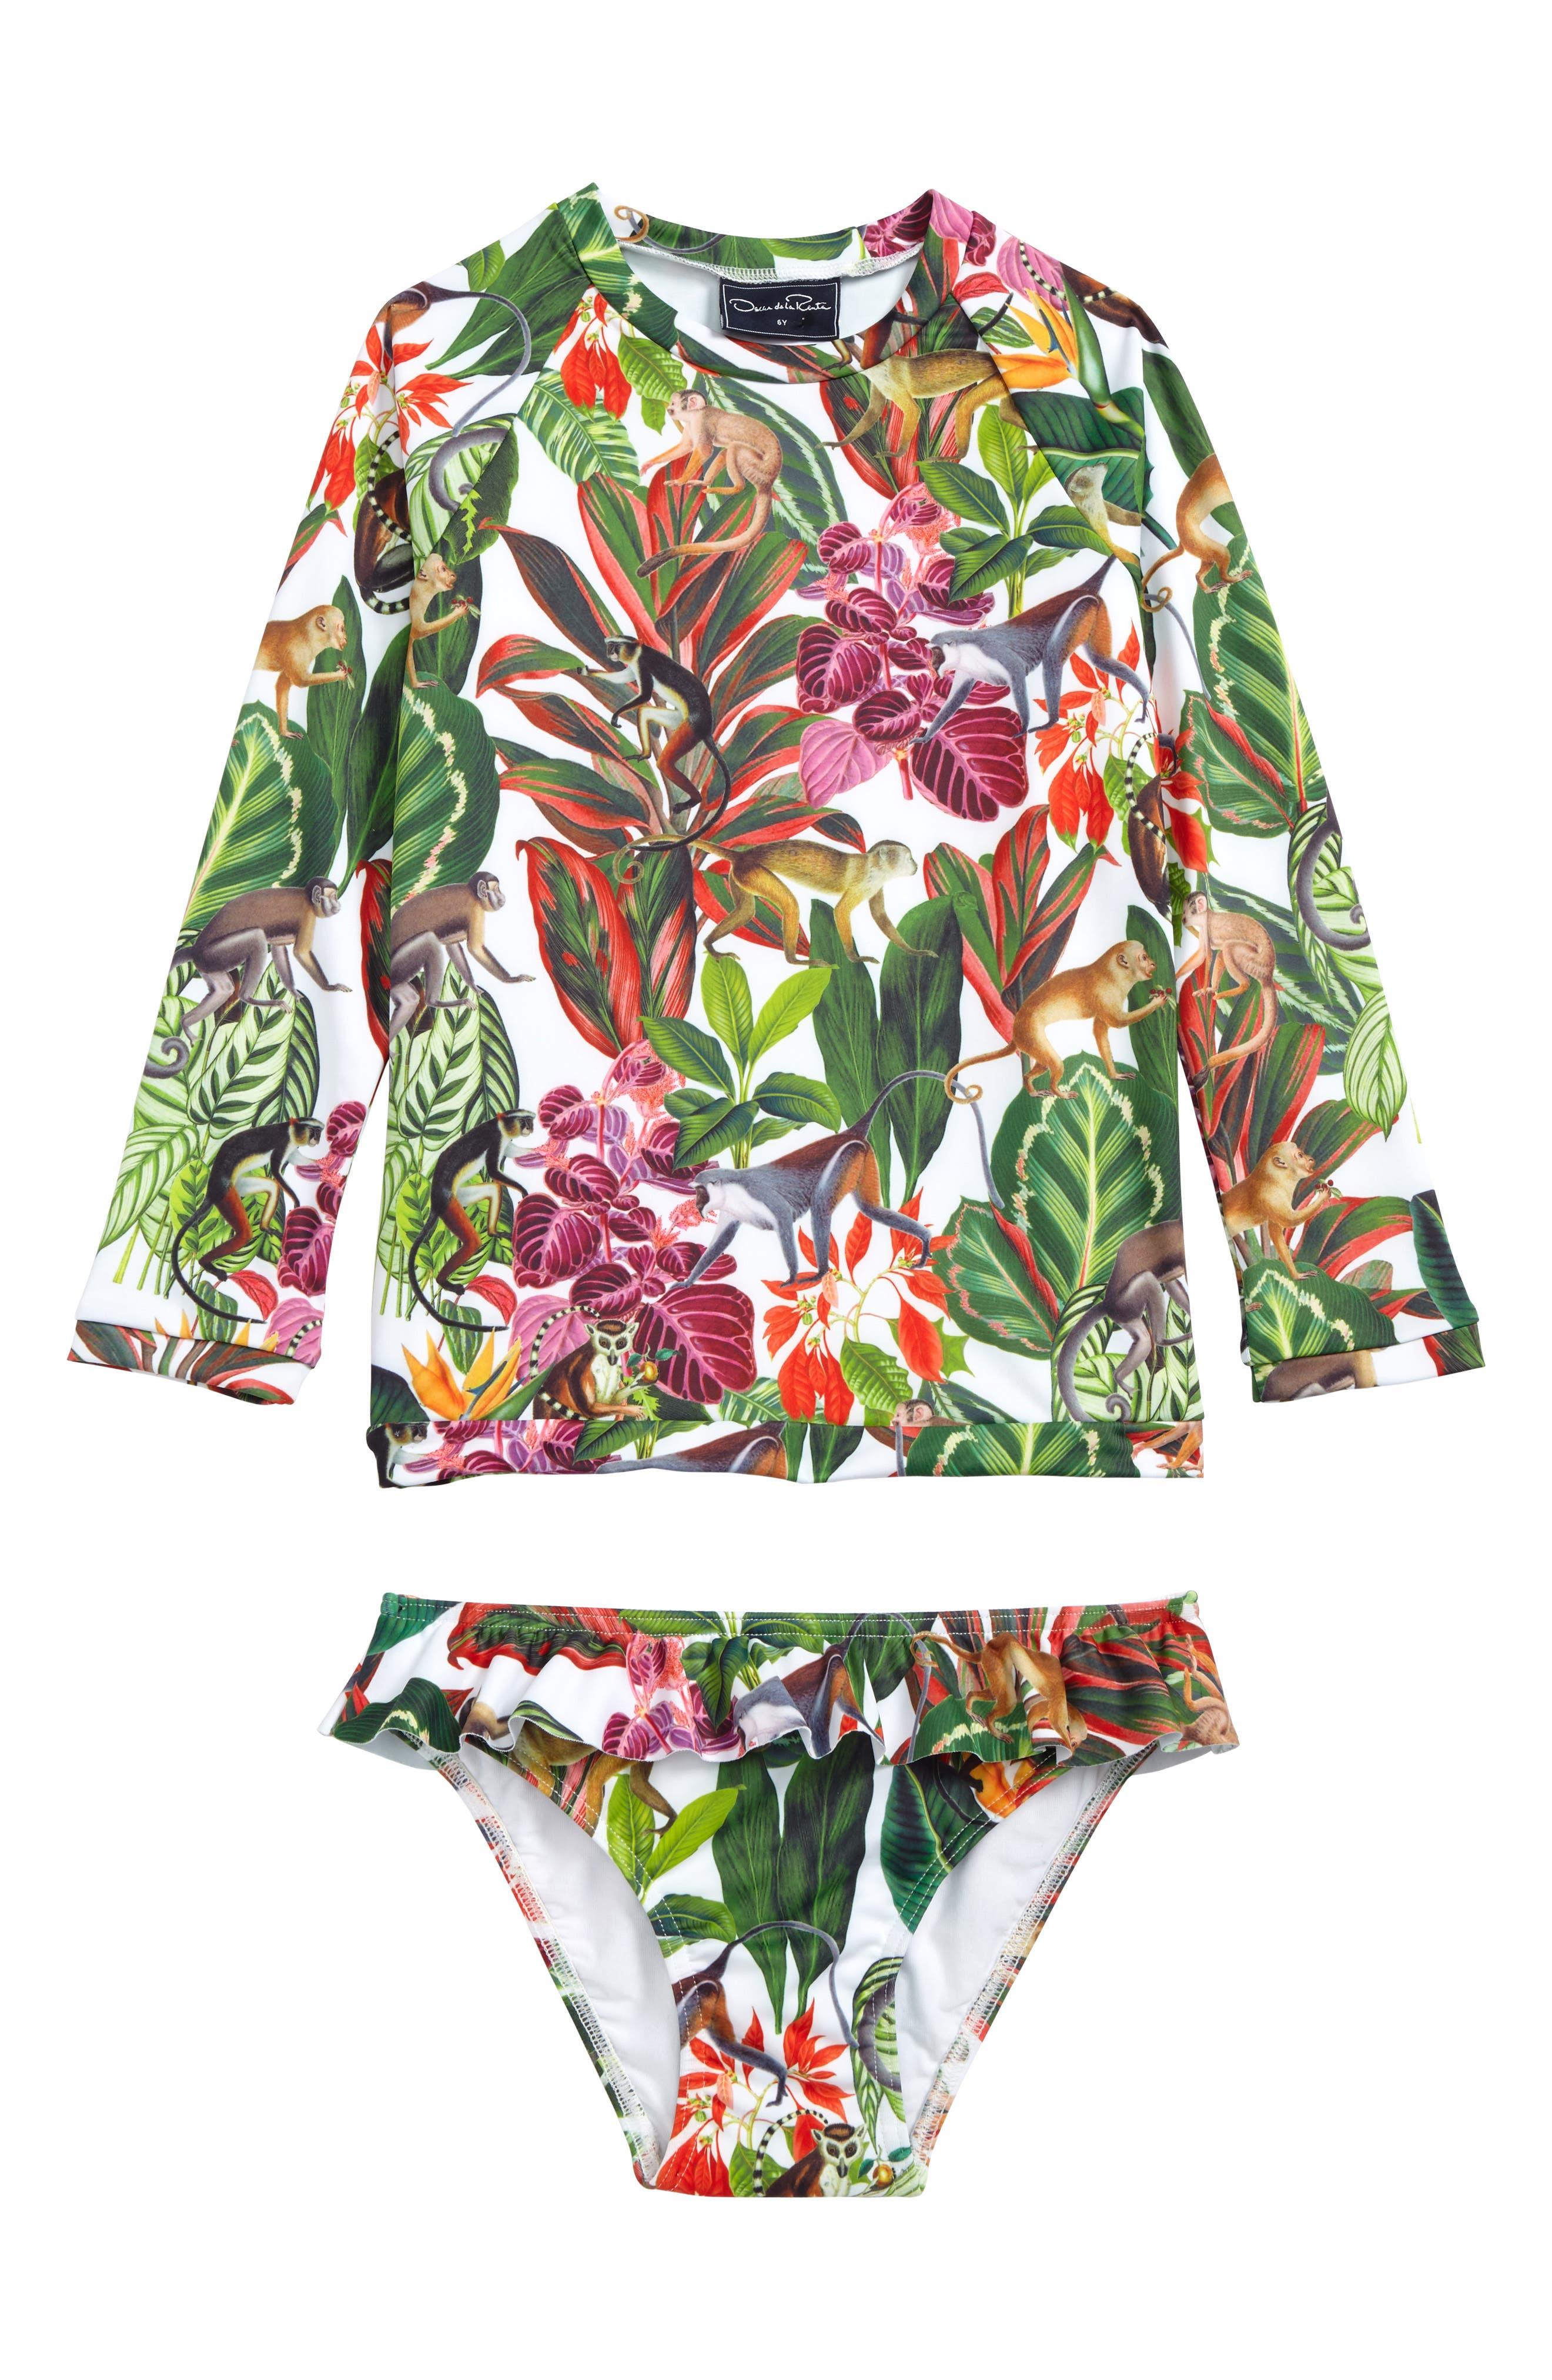 Main Image - Oscar de la Renta Jungle Monkeys Two-Piece Rashguard Swimsuit (Toddler Girls, Little Girls & Big Girls)